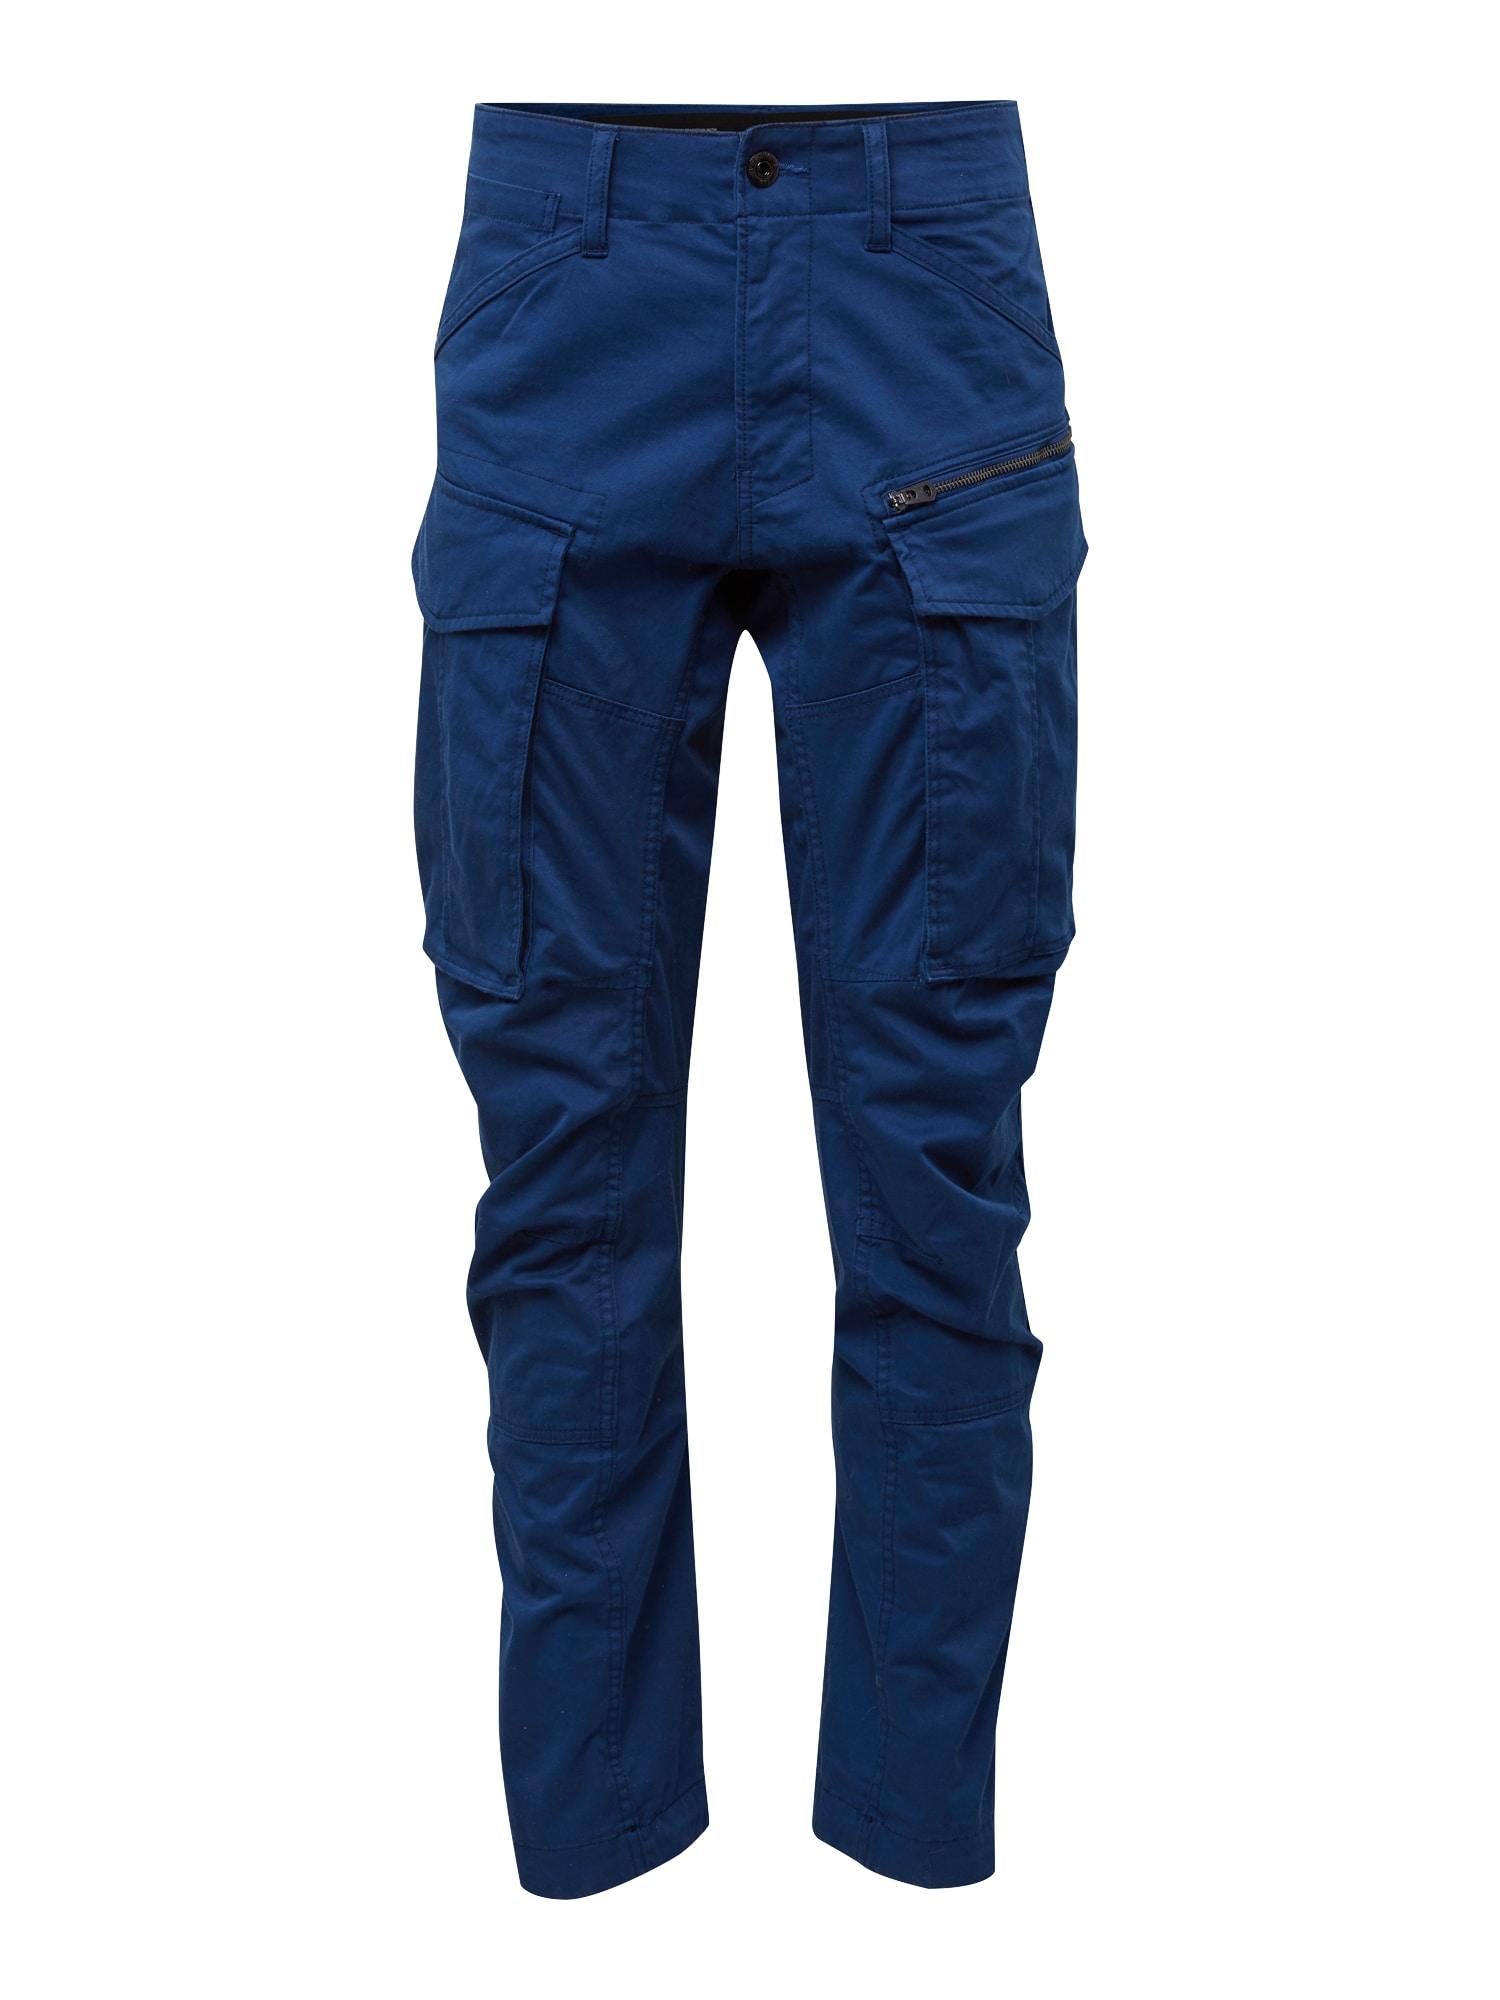 Kapsáče Rovic 3D Tapered tmavě modrá G-STAR RAW